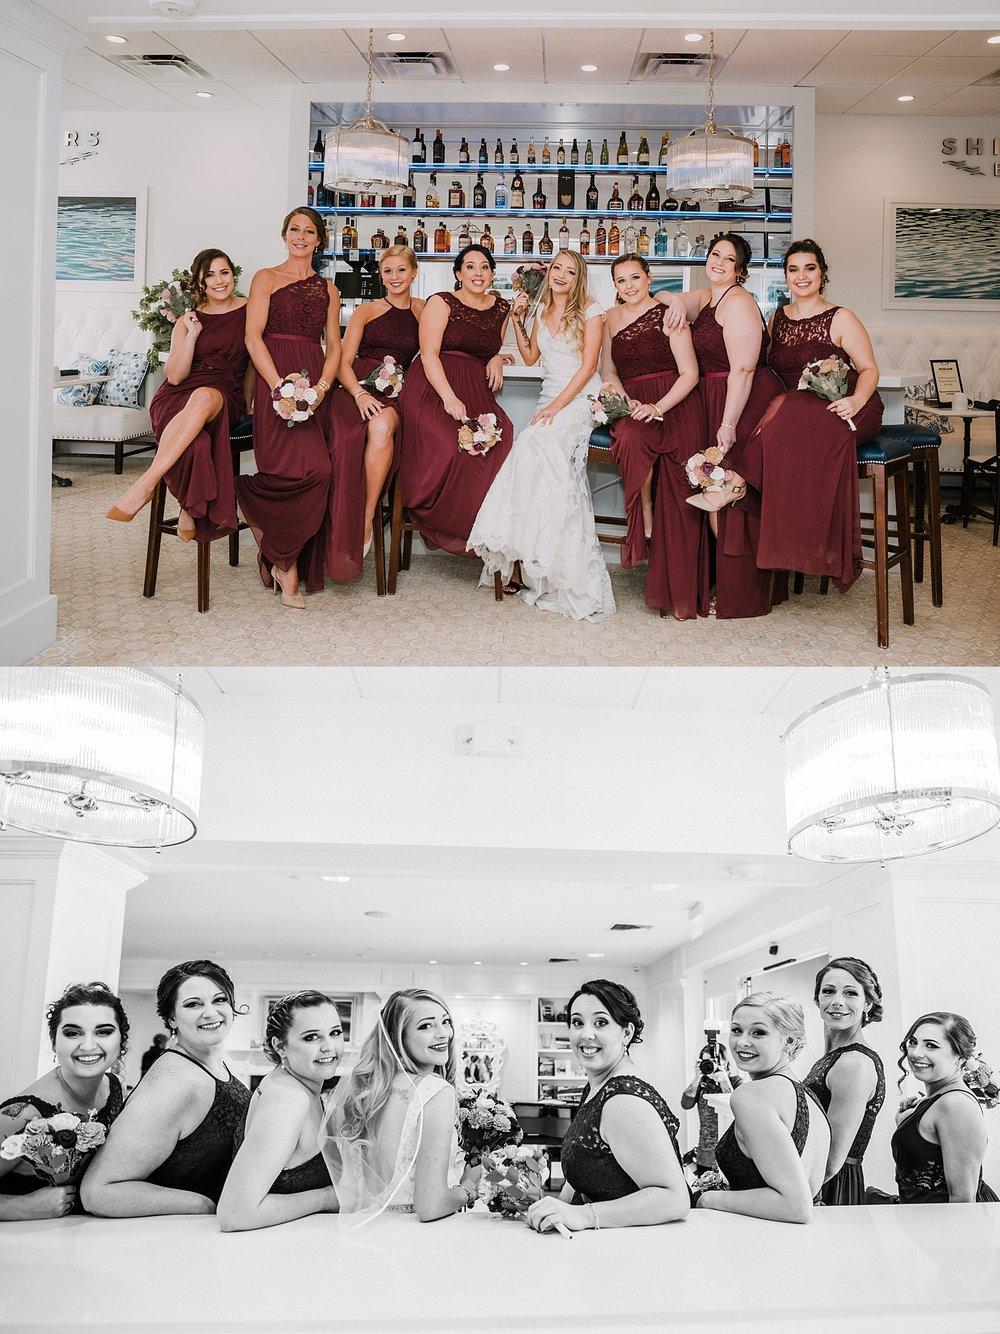 Icona Golden Inn Avalon New Jersey wedding photographer